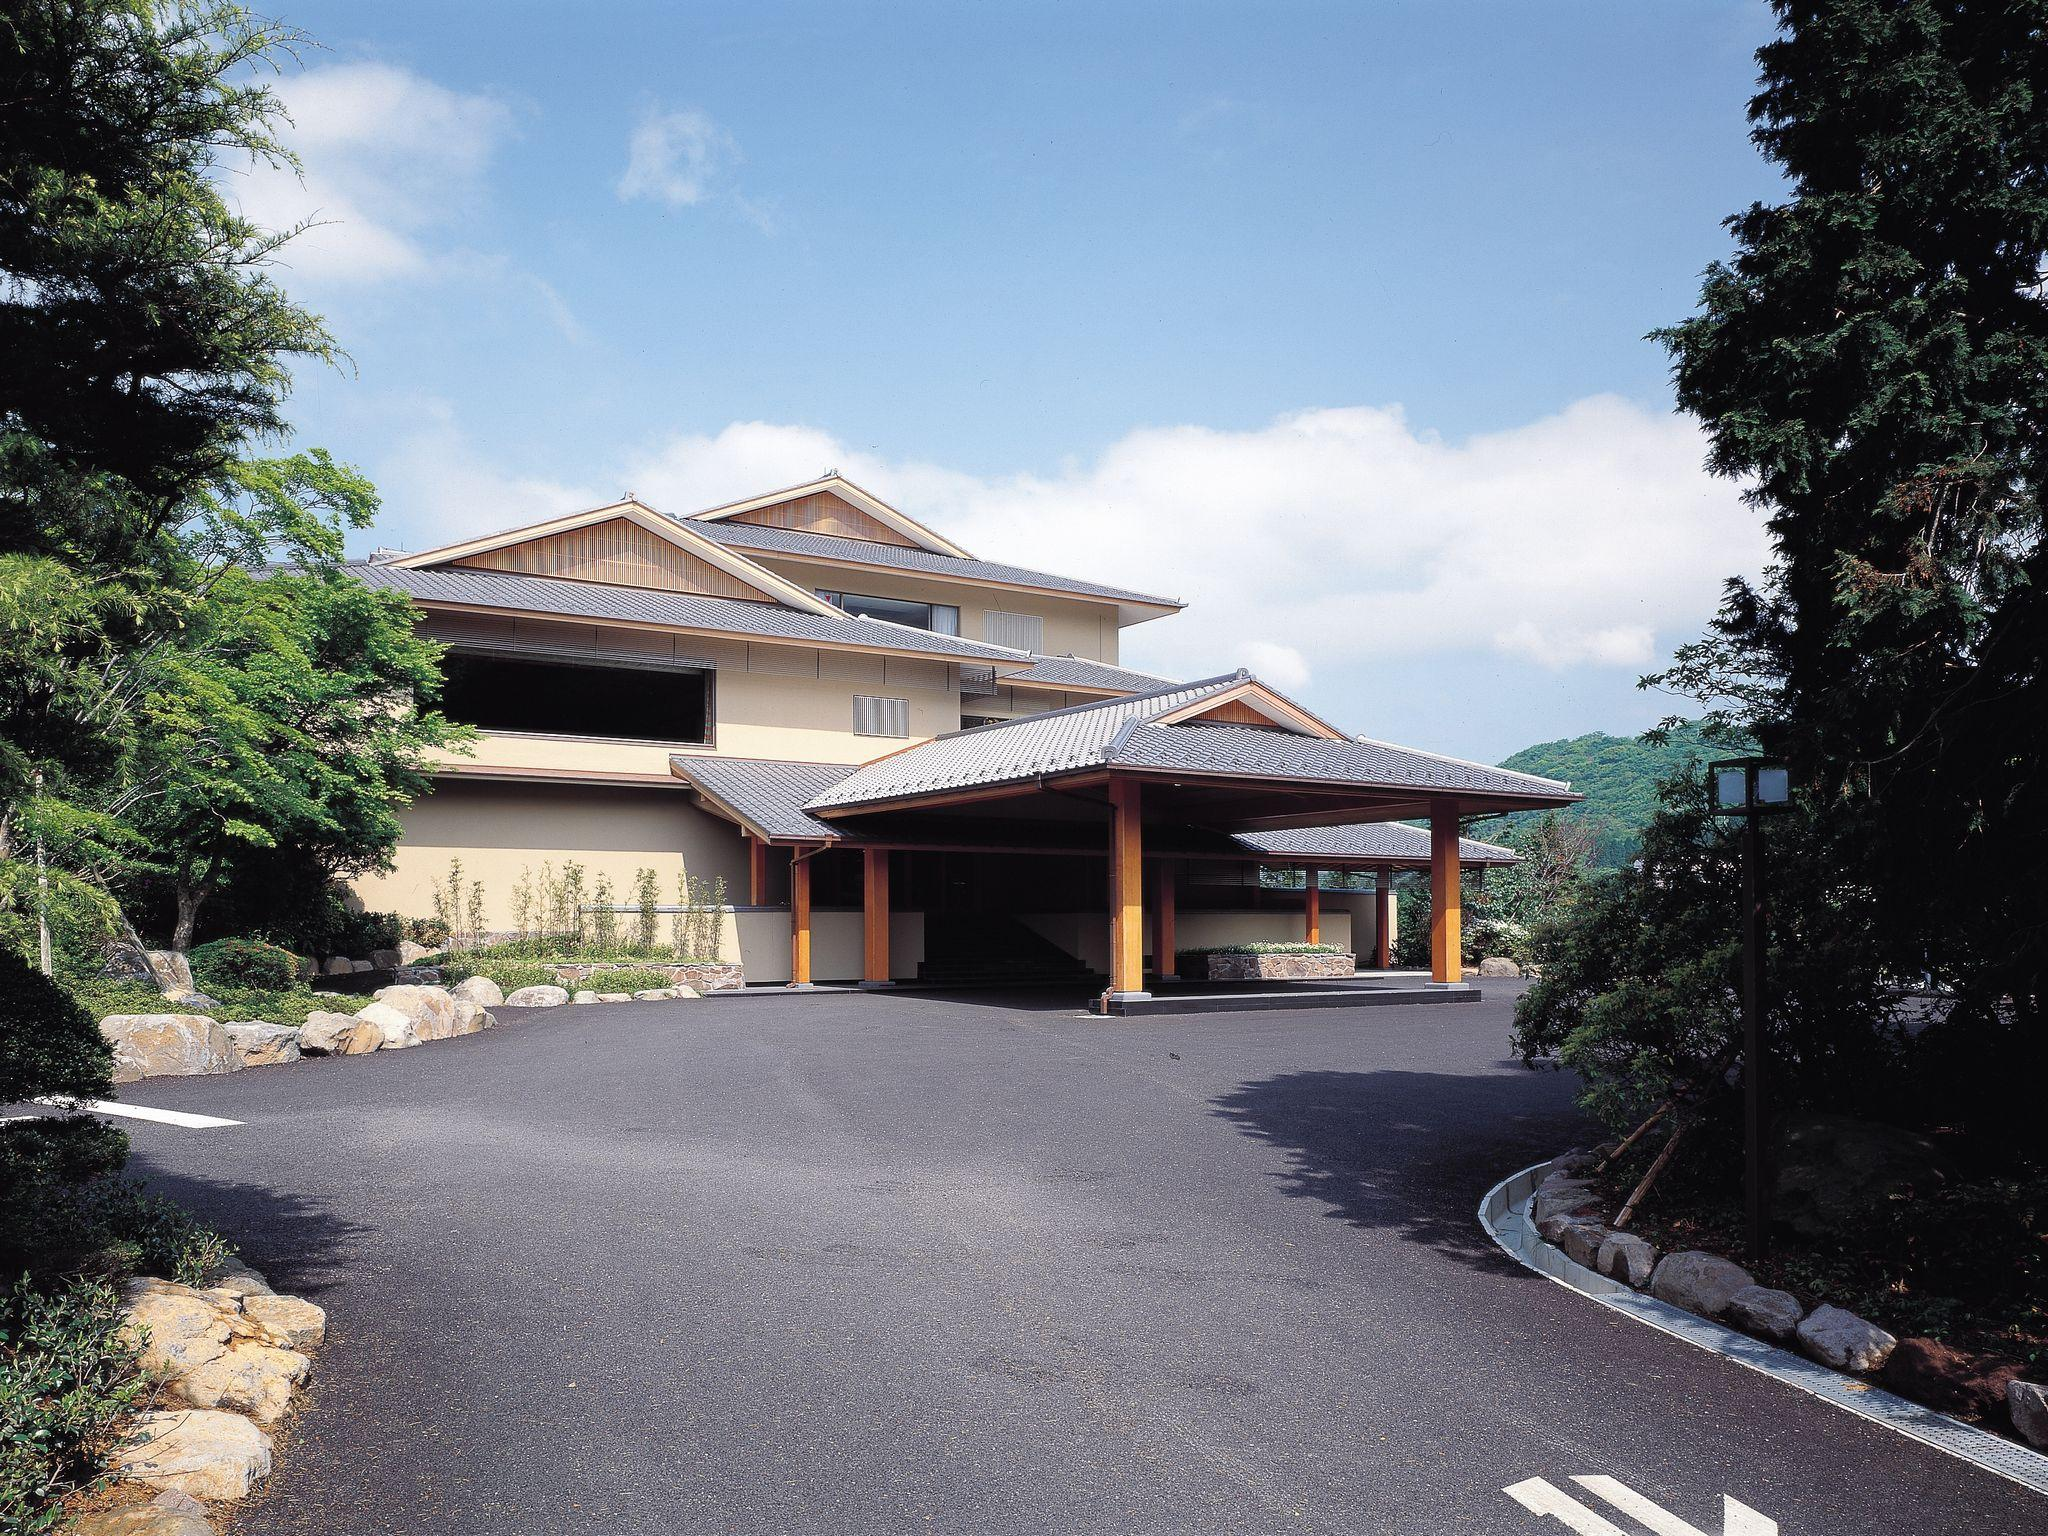 Ryokan Ryuguden